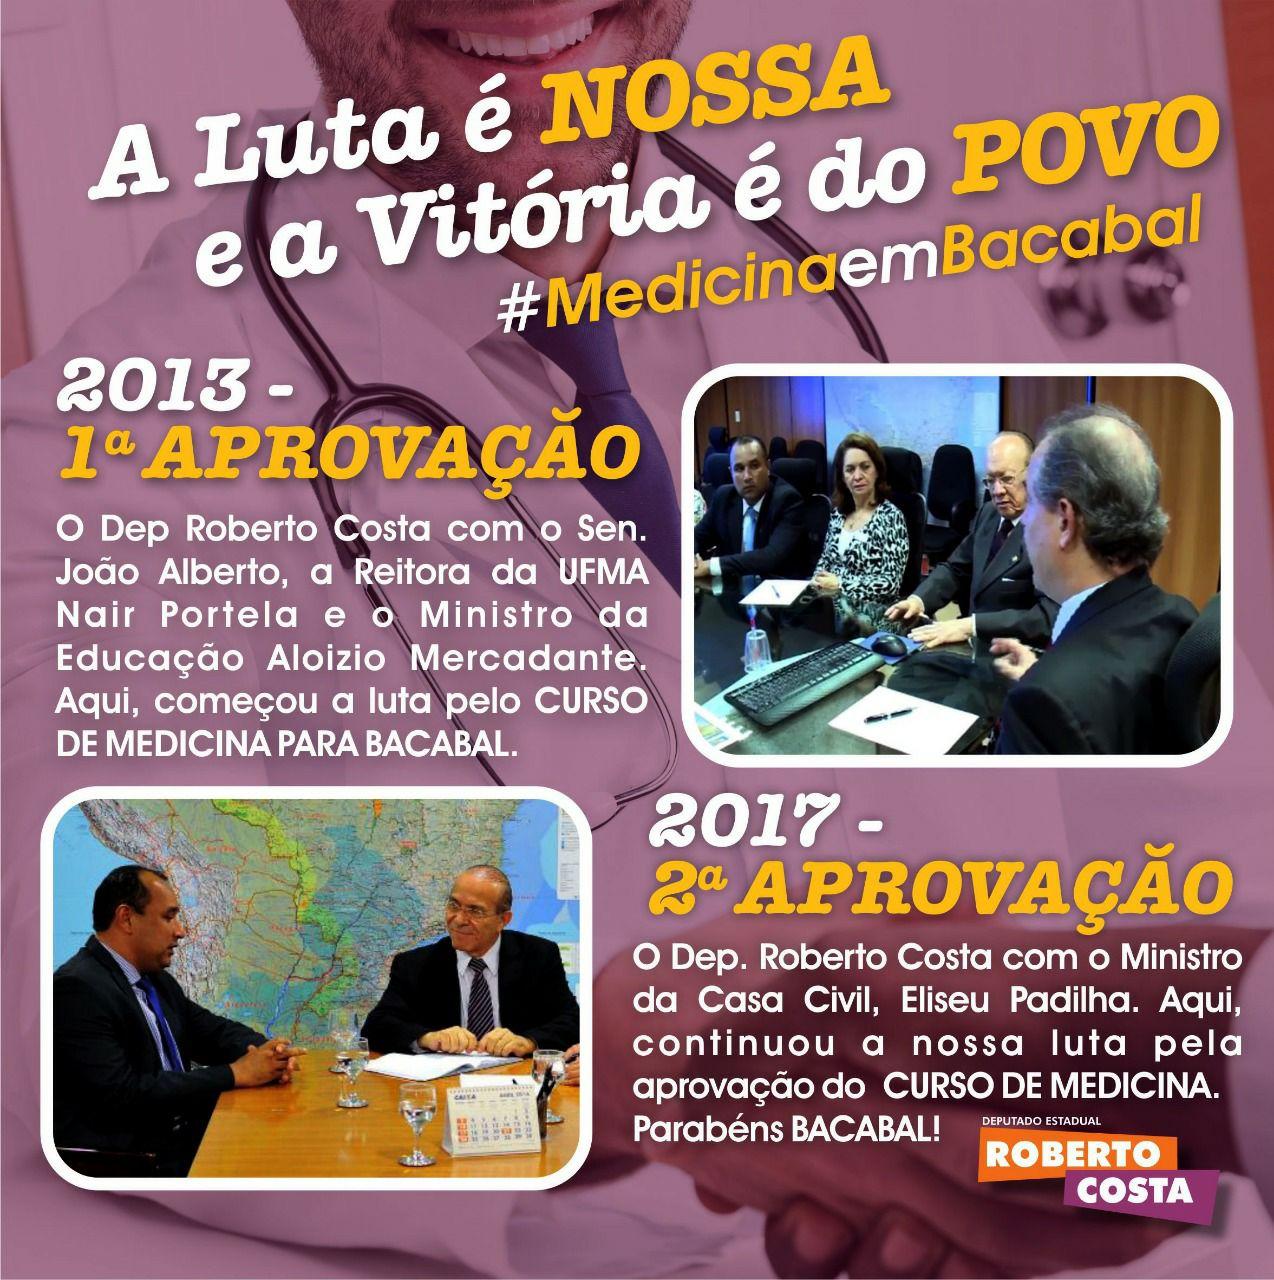 CURSO DE MEDICINA EM BACABAL